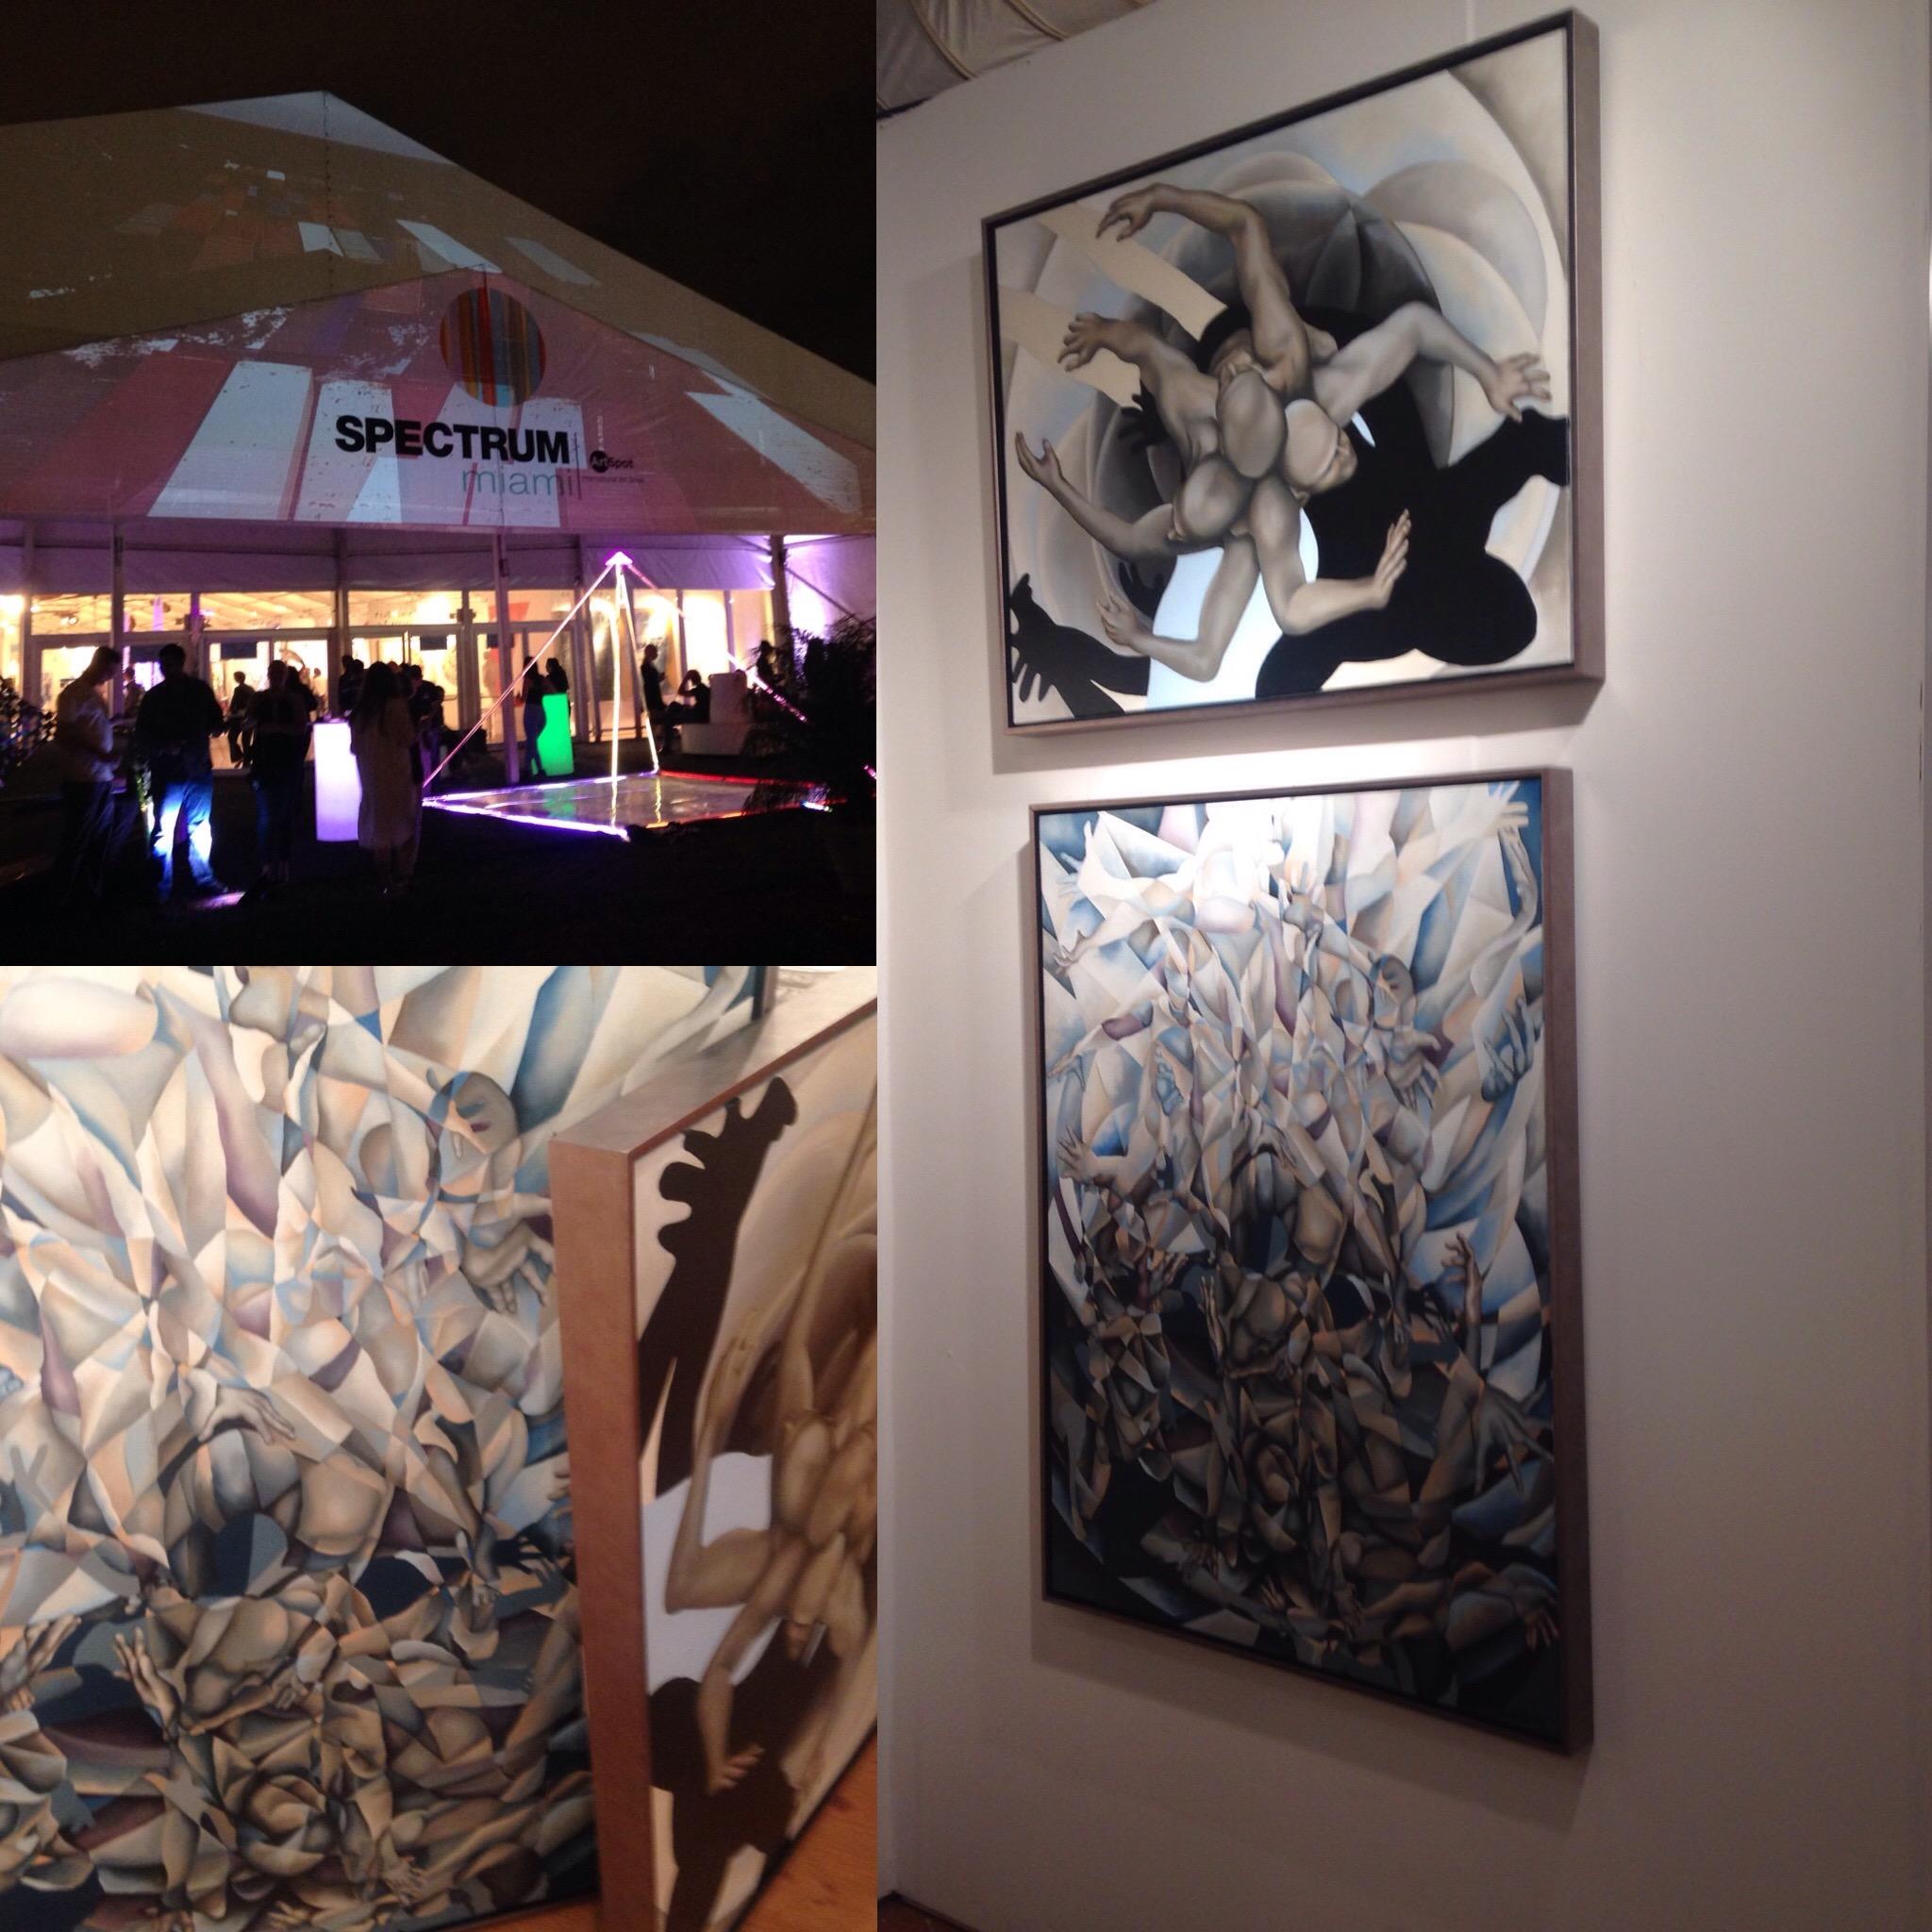 Miami Art Week Art Spectrum Miami Art Basel 2015 #gotitdone #girlpainter #ArtExpoNYnext